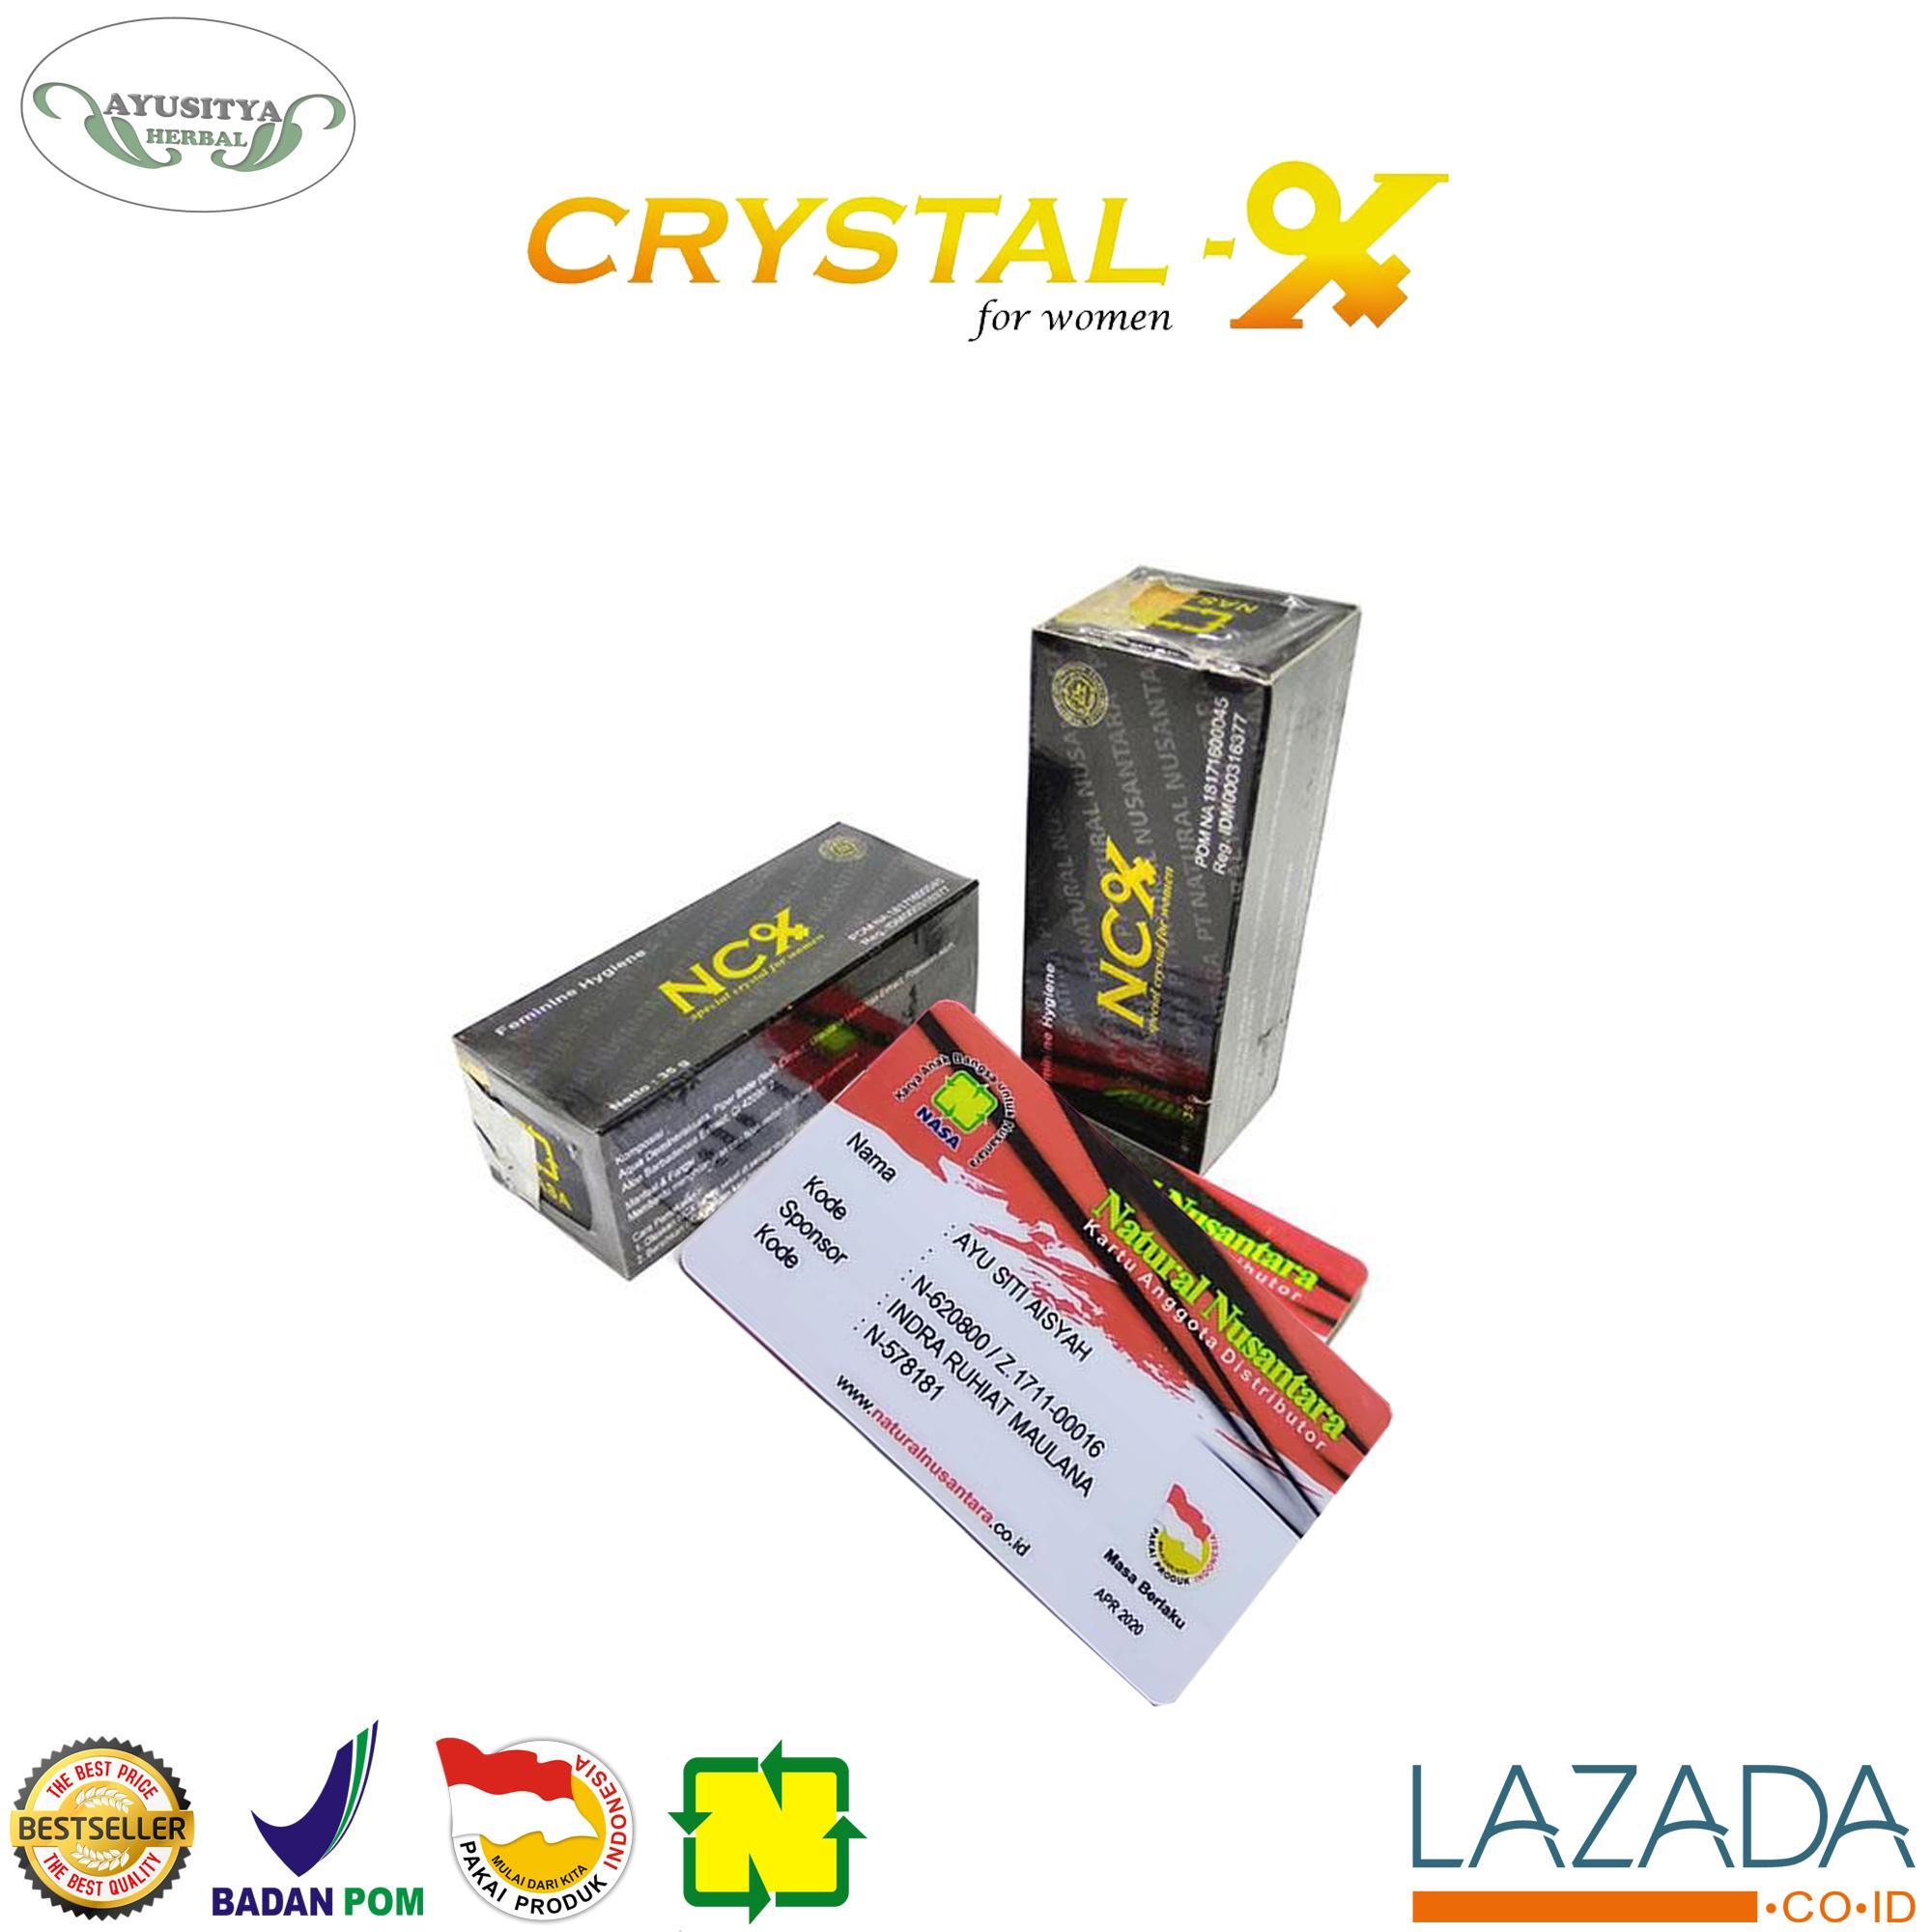 Buy Sell Cheapest Crystal X Original Best Quality Product Deals Crytal Cristal New Kristal 100 Agen Nasa Obat Herbal Keputihan